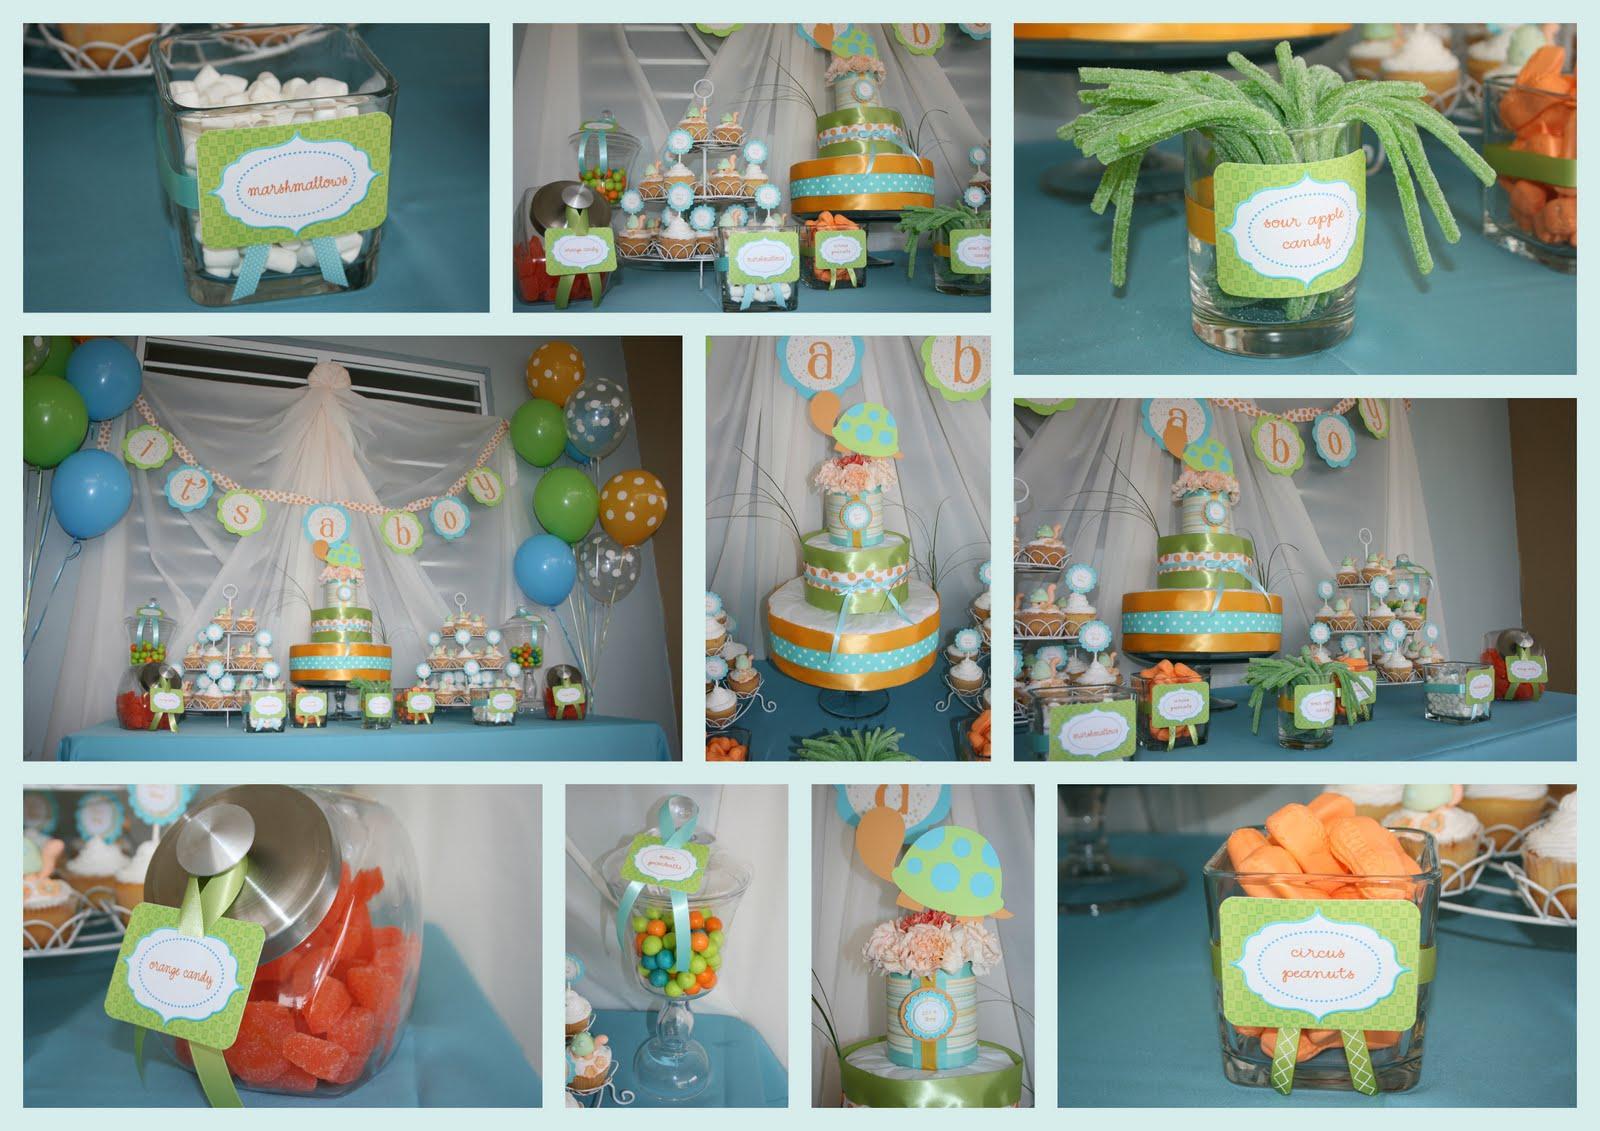 inspiring shower for decor themed diy animals baby cool cute design best boy boys decorations jungle ideas